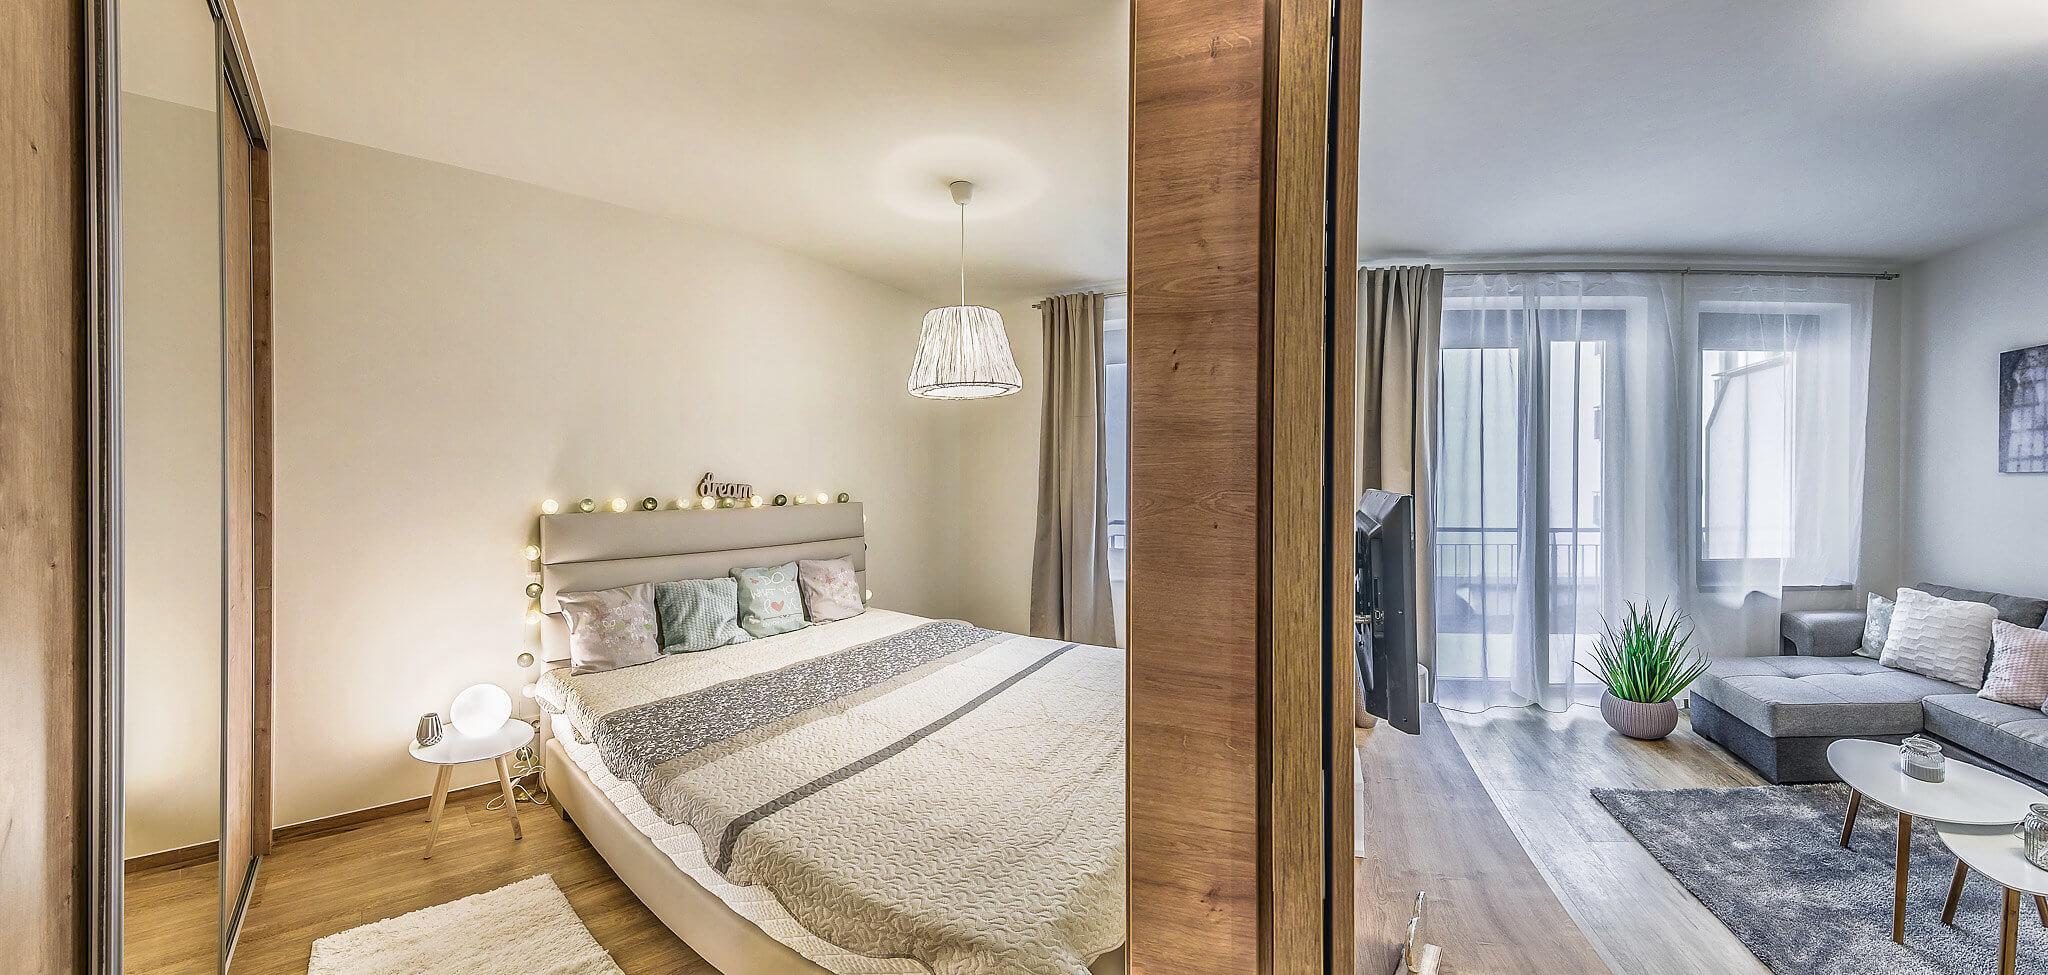 One bedroom Standard 6 - Art Homes Budapest